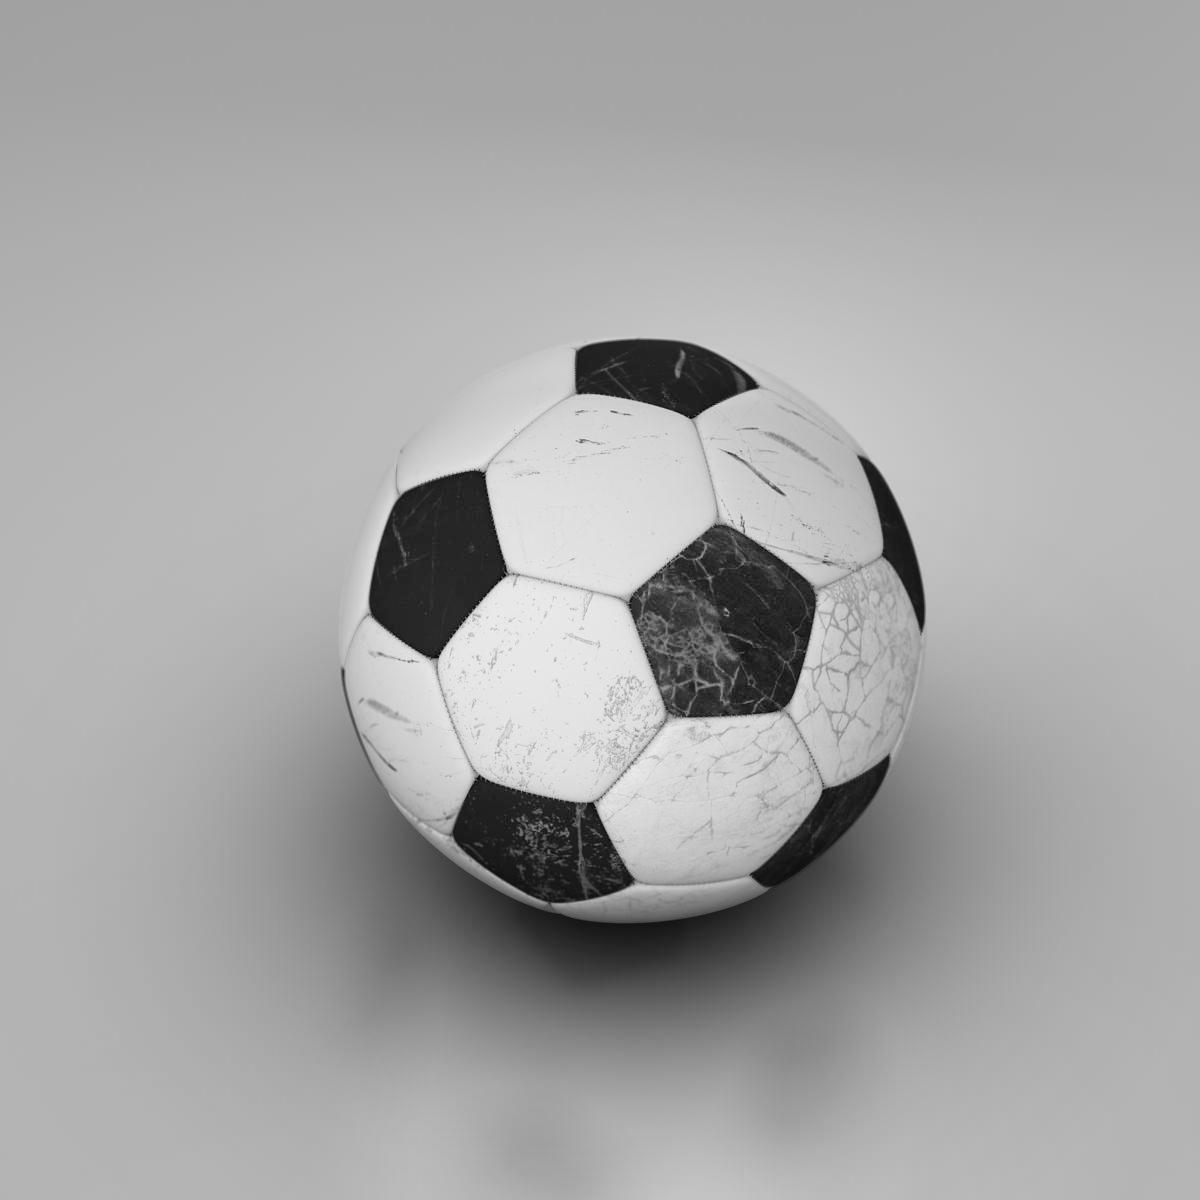 soccerball black white 3d model 3ds max fbx c4d ma mb obj 203950